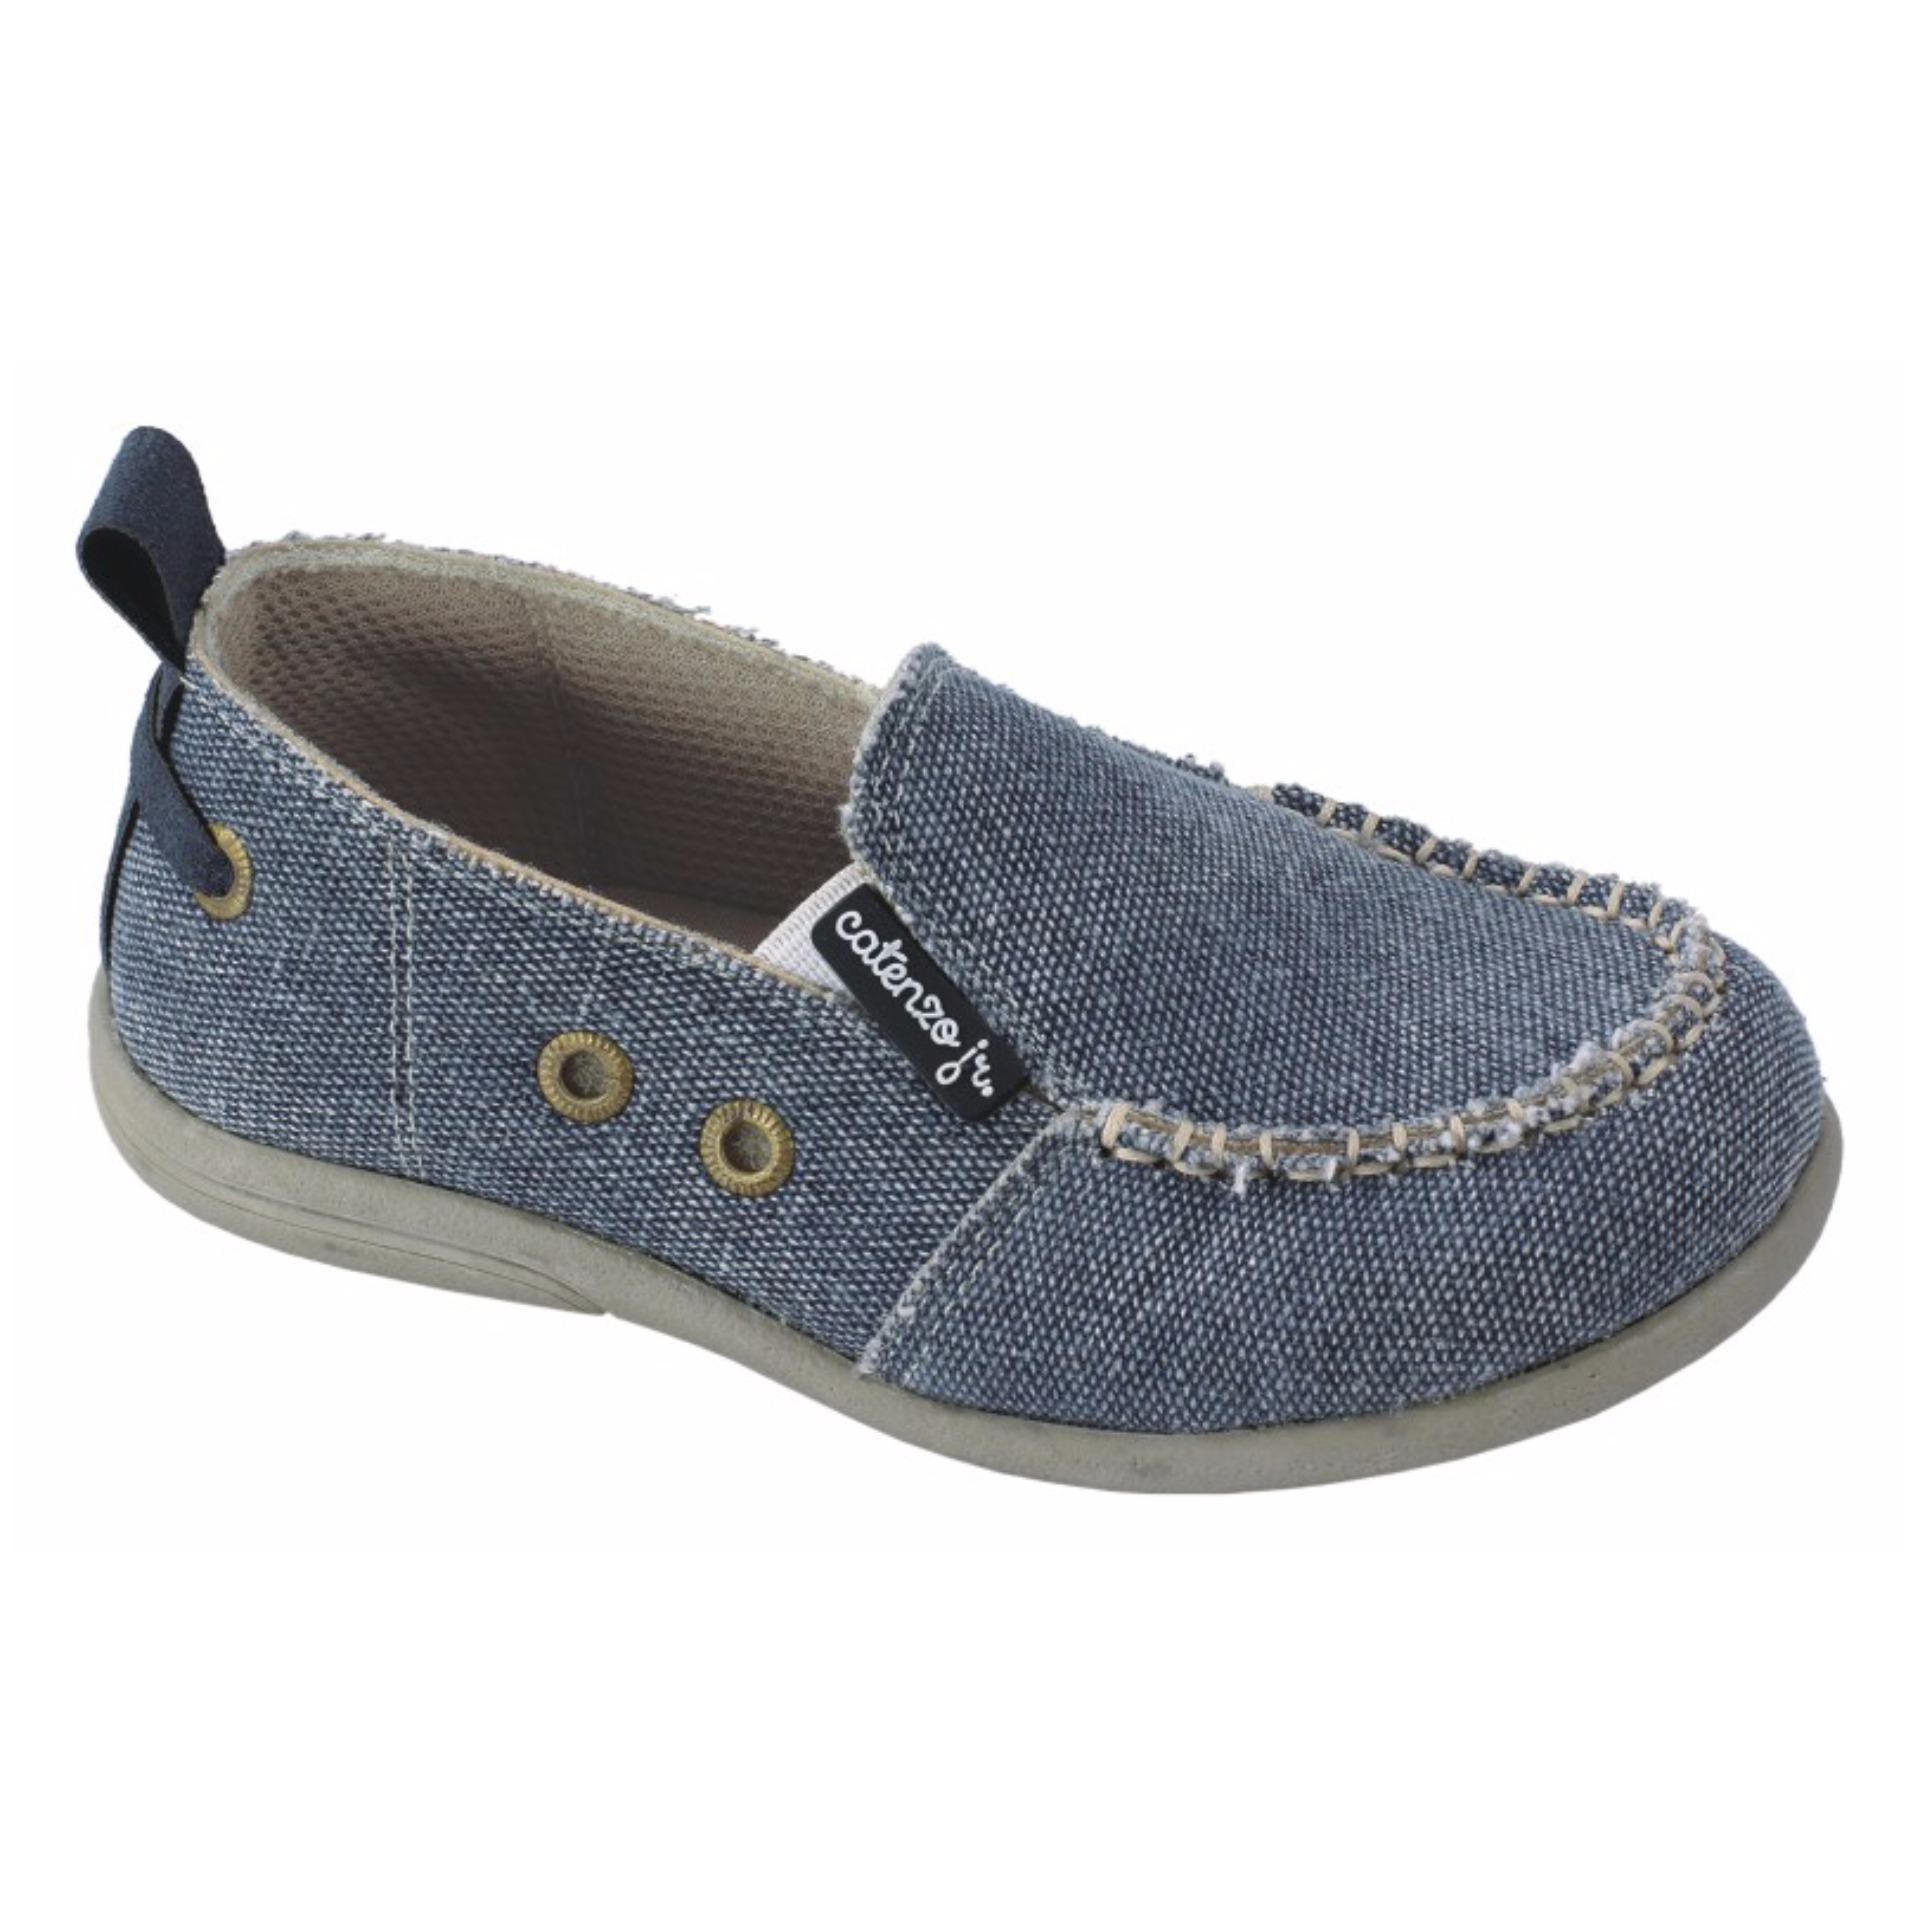 Toko Catenzo Junior Sepatu Casual Denim Slip On Anak Laki Laki Catenzo Junior Cad 006 Murah Jawa Barat